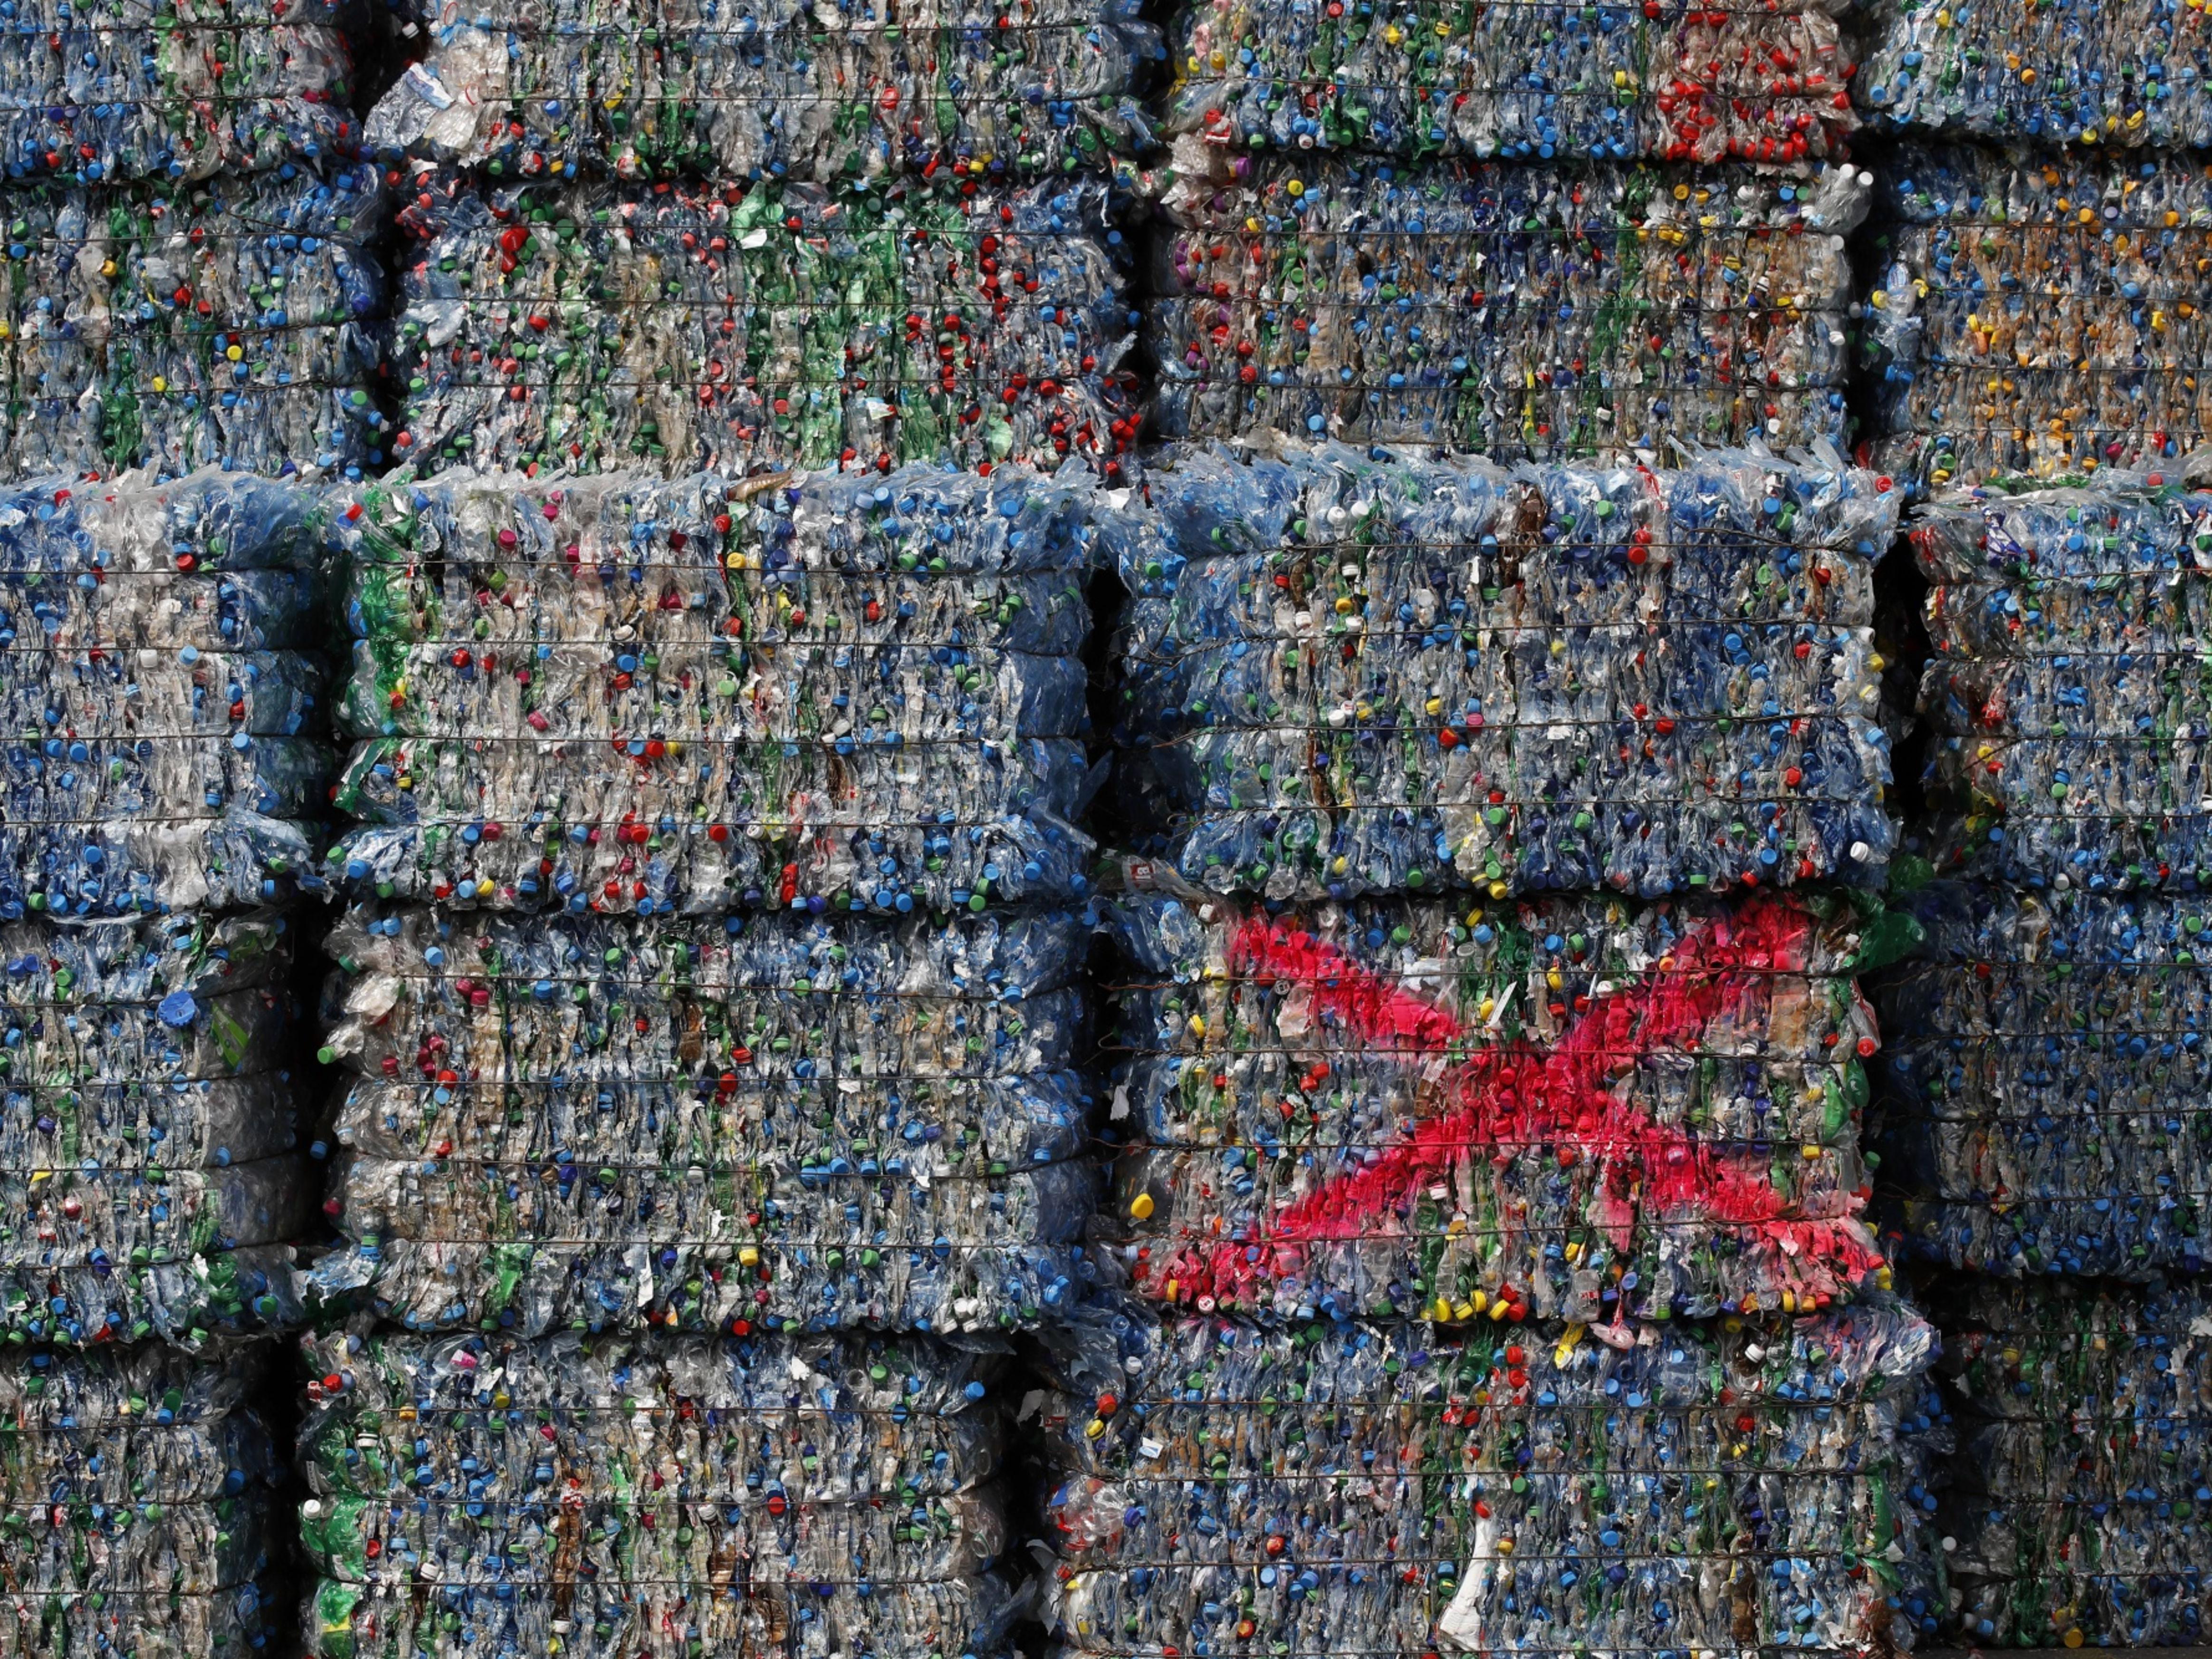 0304 movementagainstplasticwaste